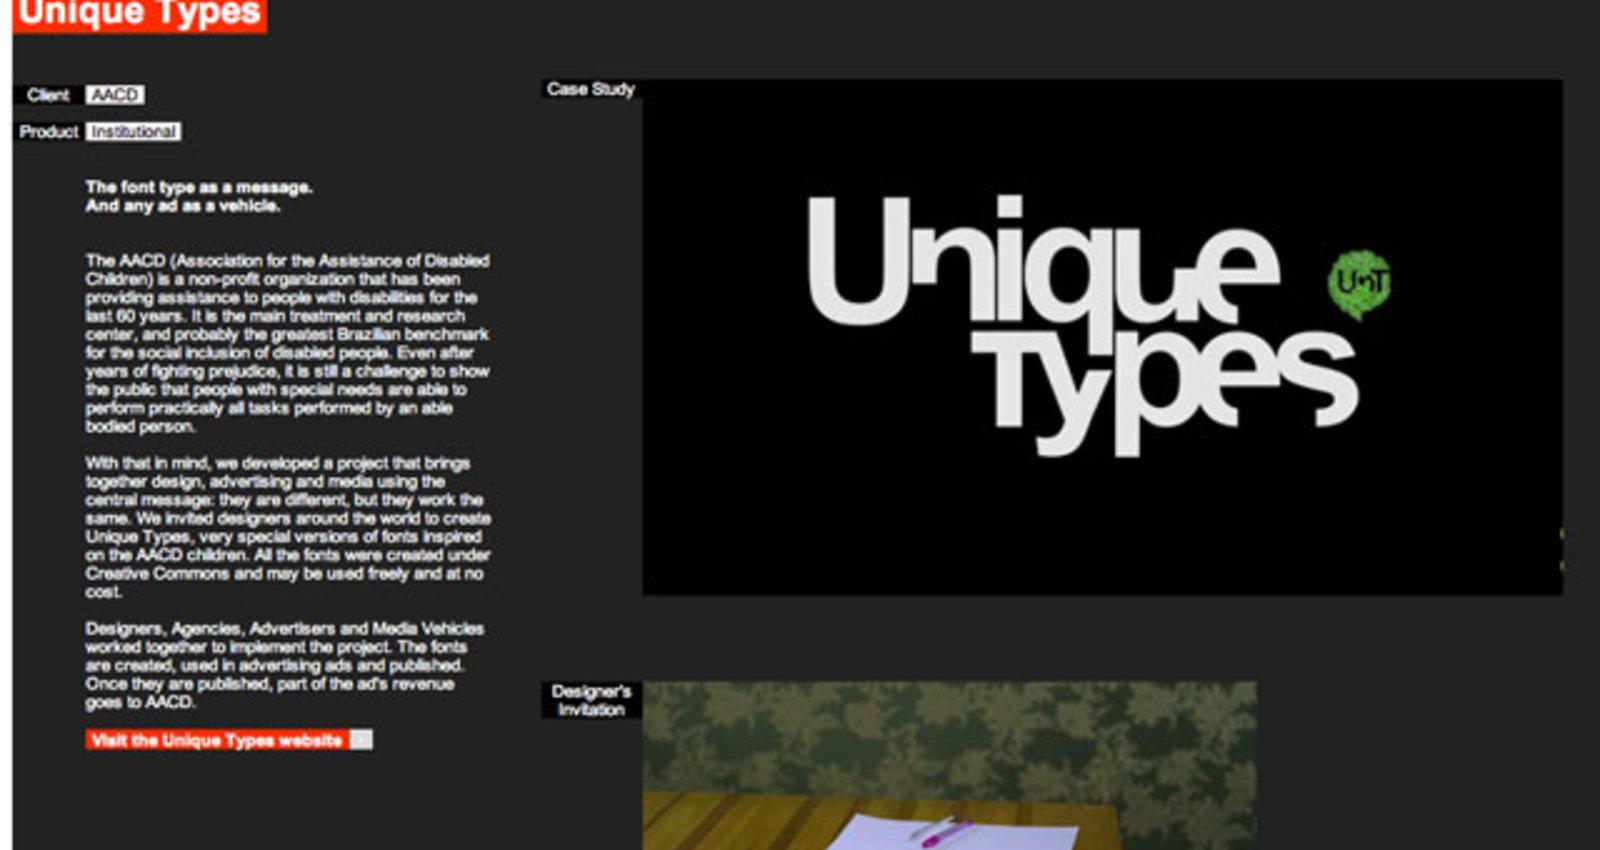 Unique Types